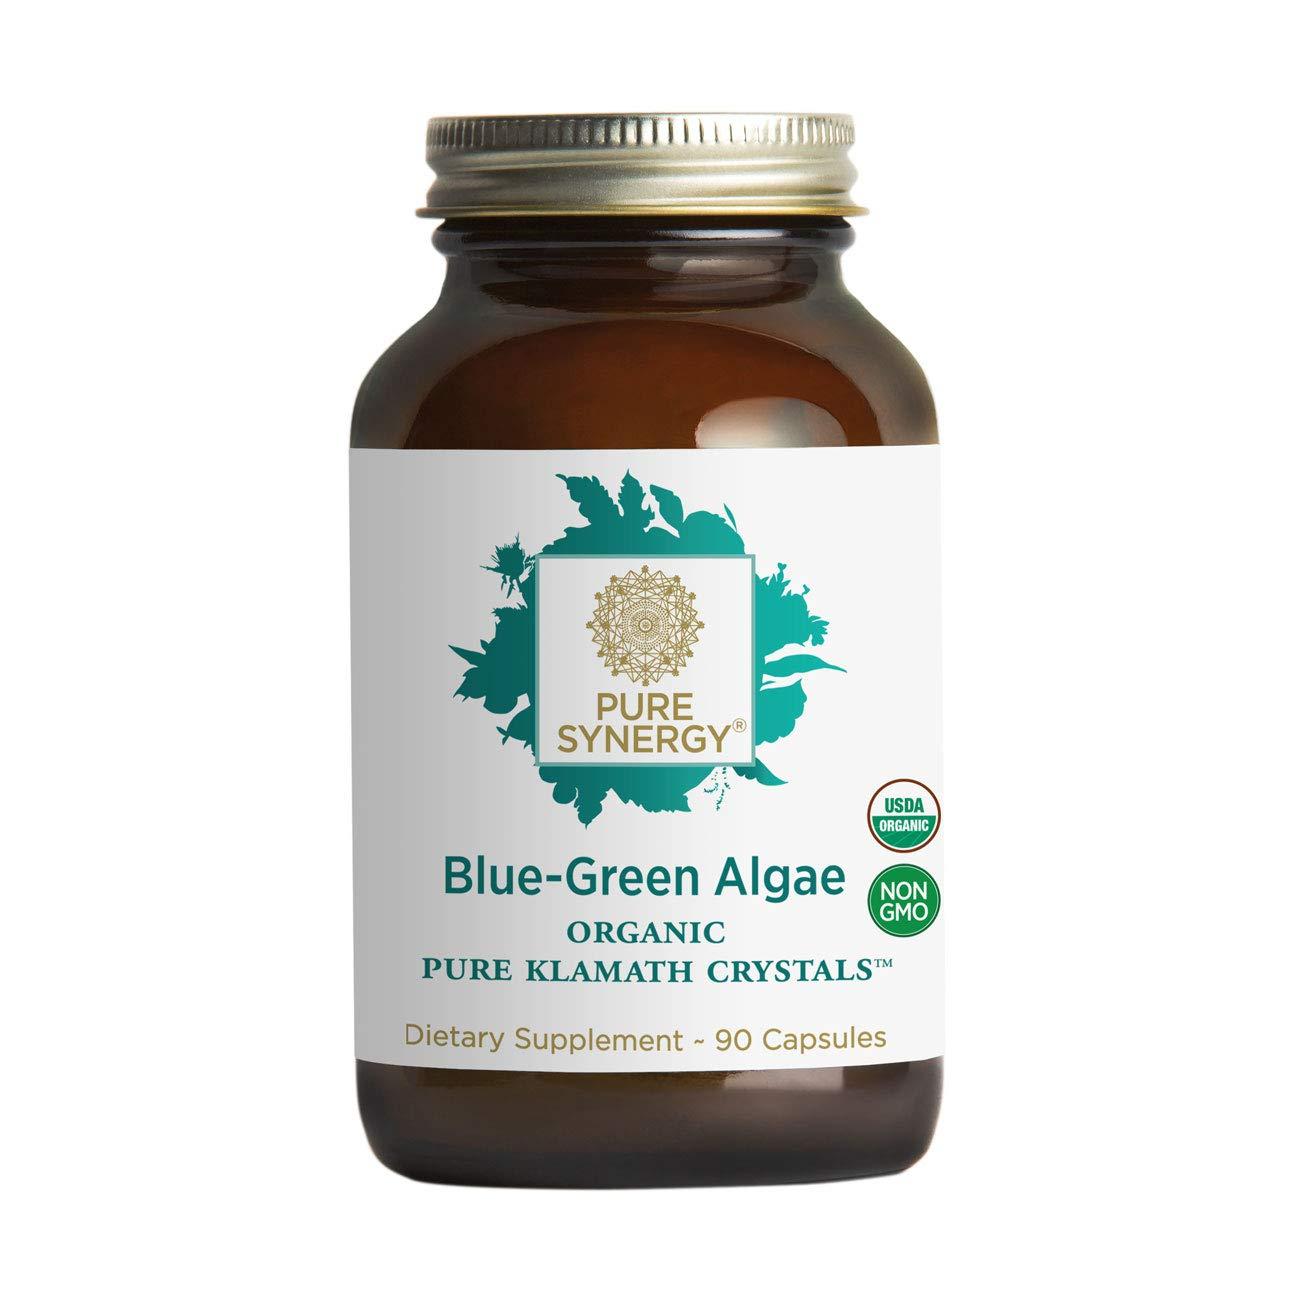 Pure Synergy USDA Organic Klamath Blue Green Algae (90 Capsules) Fully Tested, Non-GMO